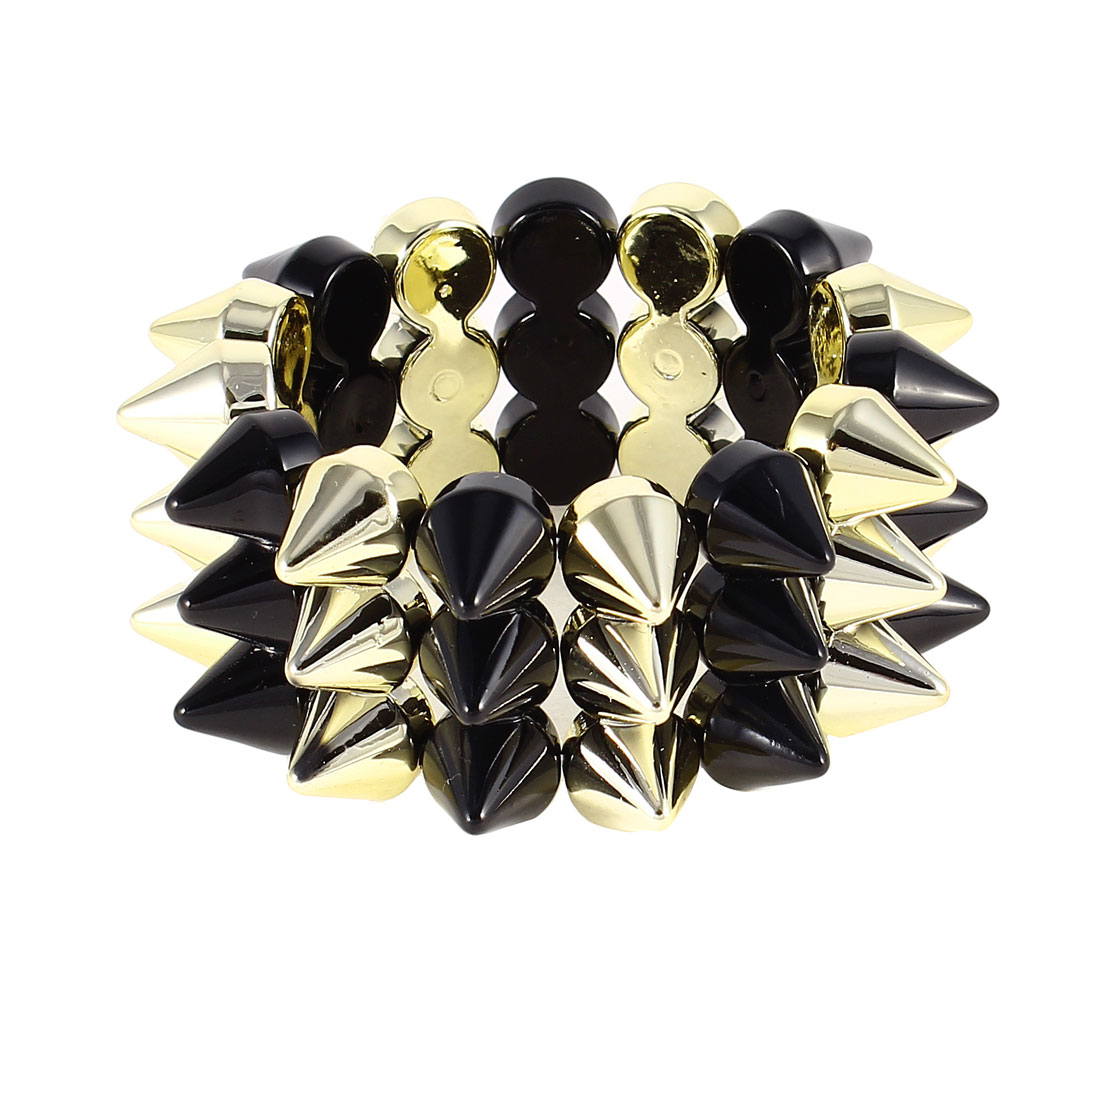 Black Gold Tone Punk Style Plastic Rivet Cone Studs Elastic Wrist Bracelet